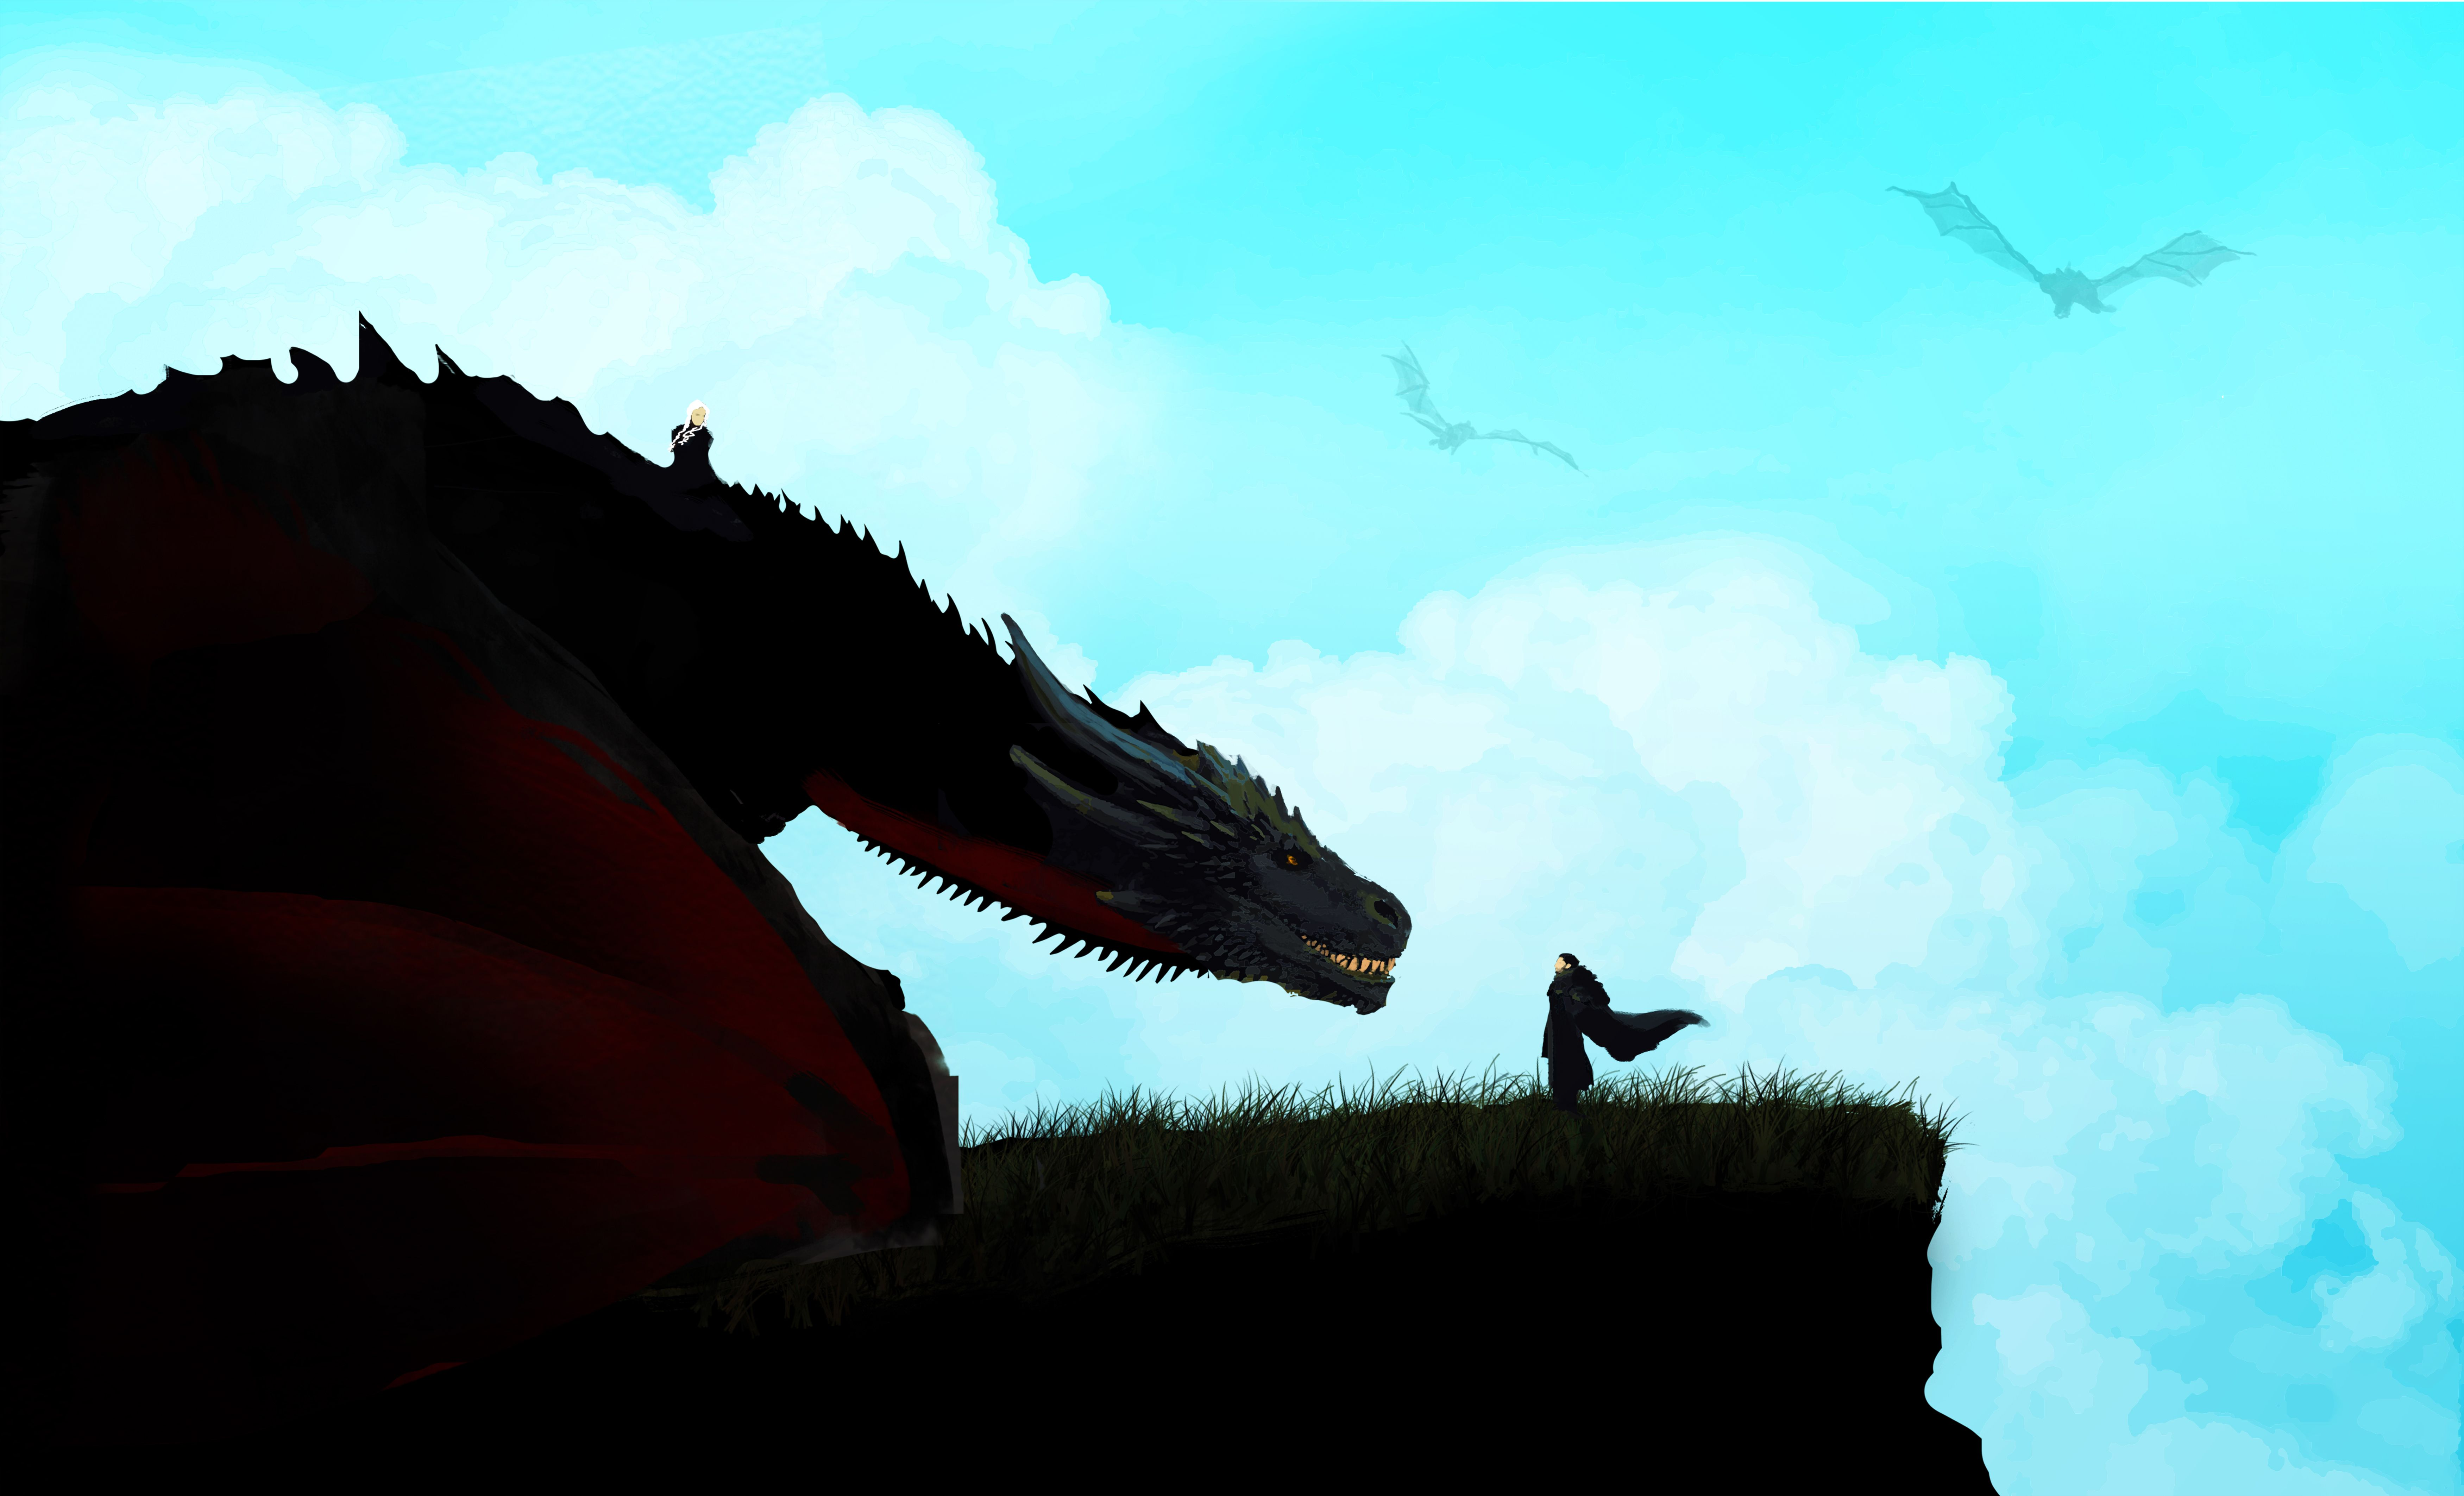 P O S I T I V E V I B E S Game Of Thrones Art Game Of Thrones Cards Dragon Artwork